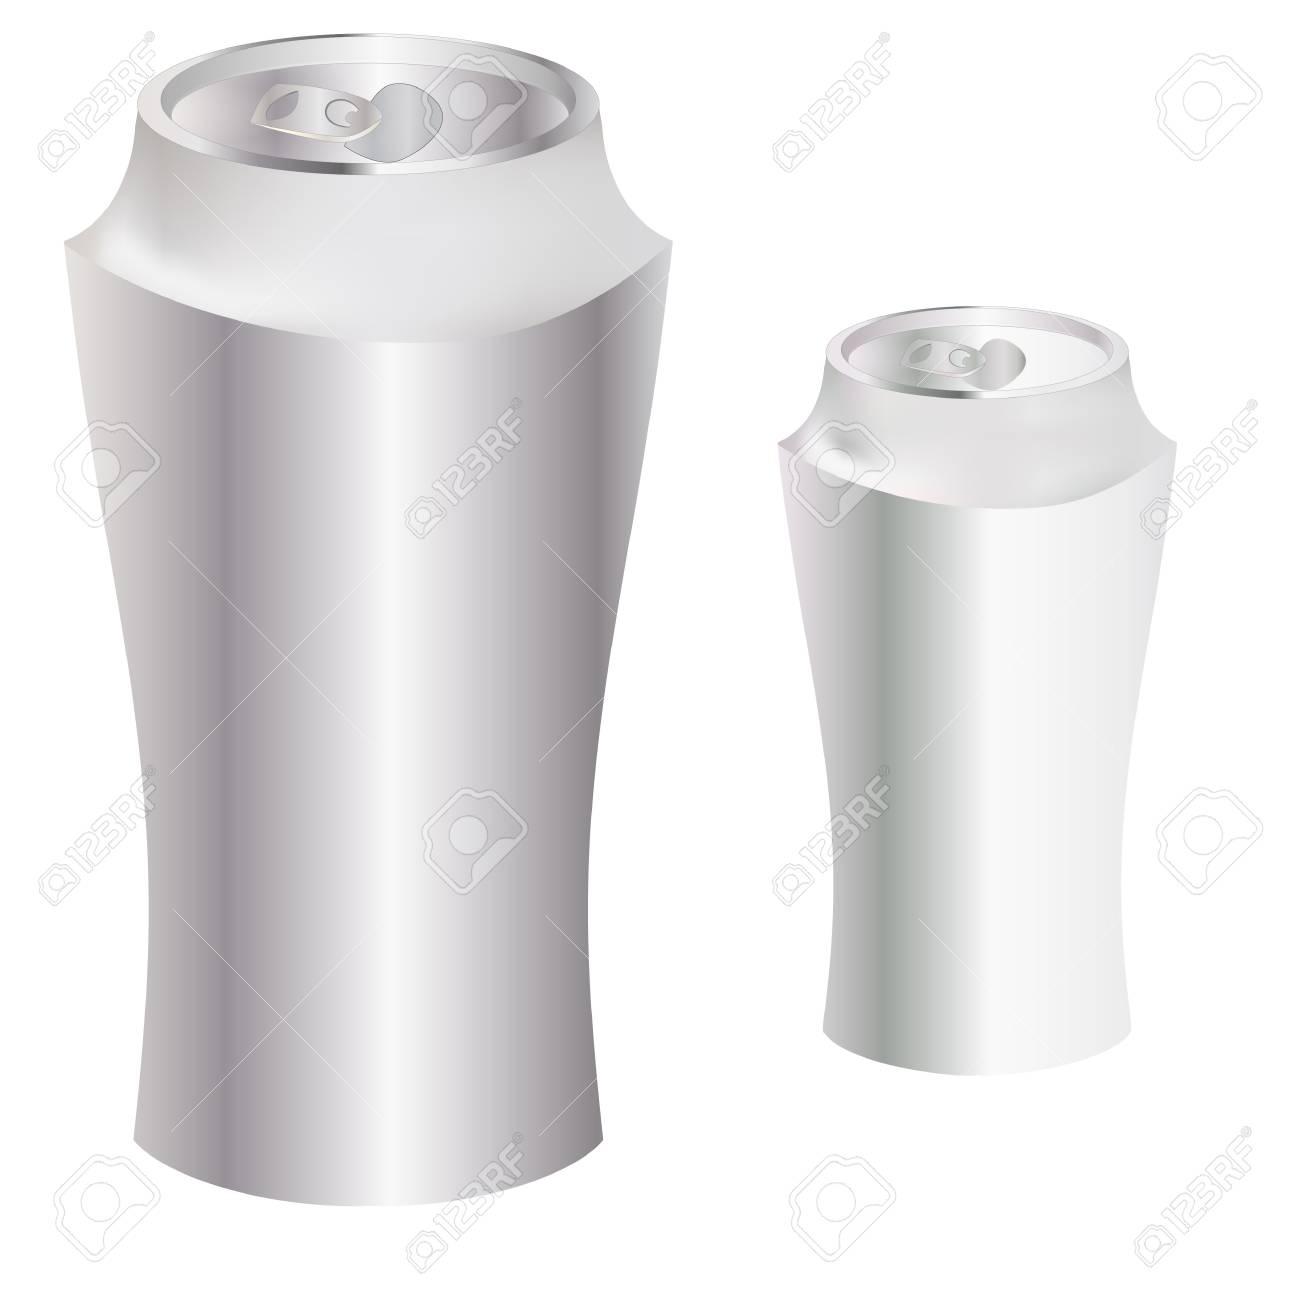 Blank Metal Can Stock Vector - 8413243